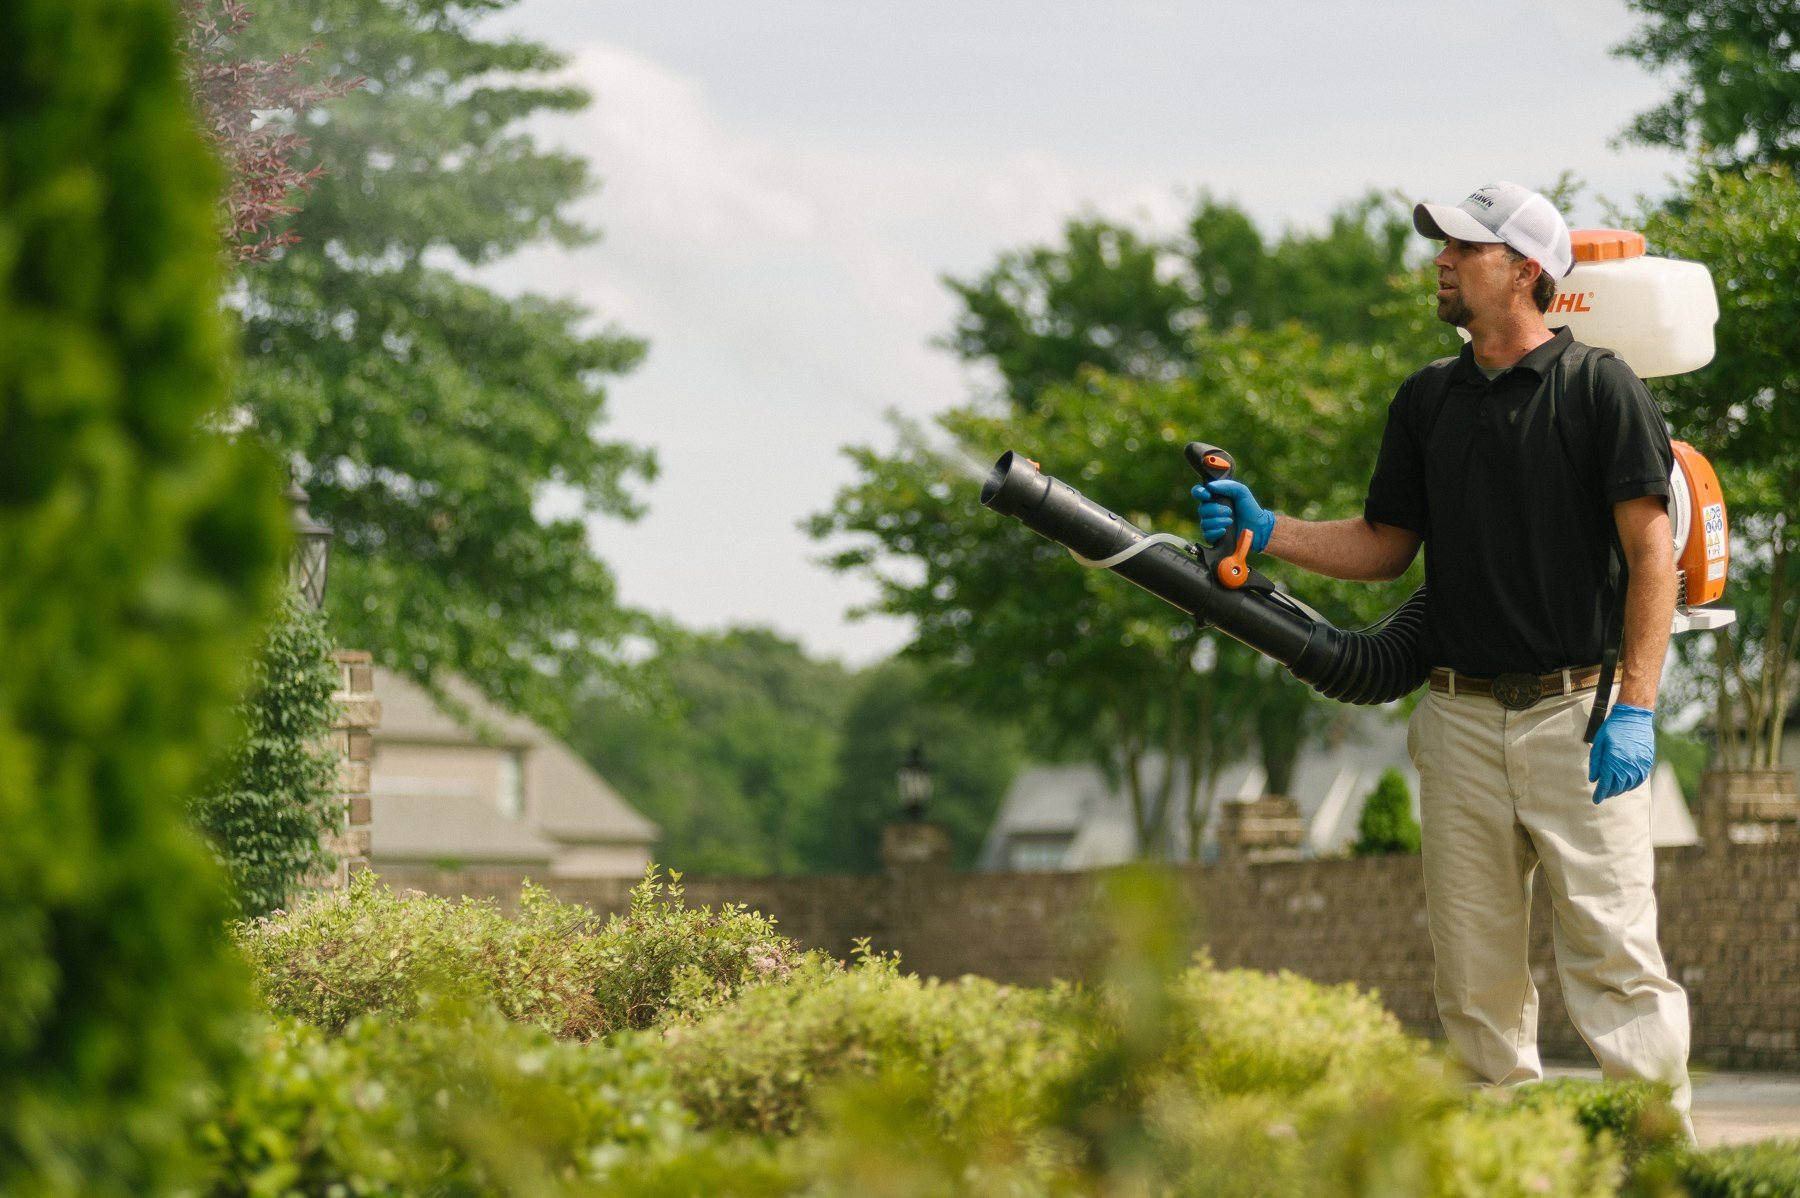 mosquito control technician spraying shrubs